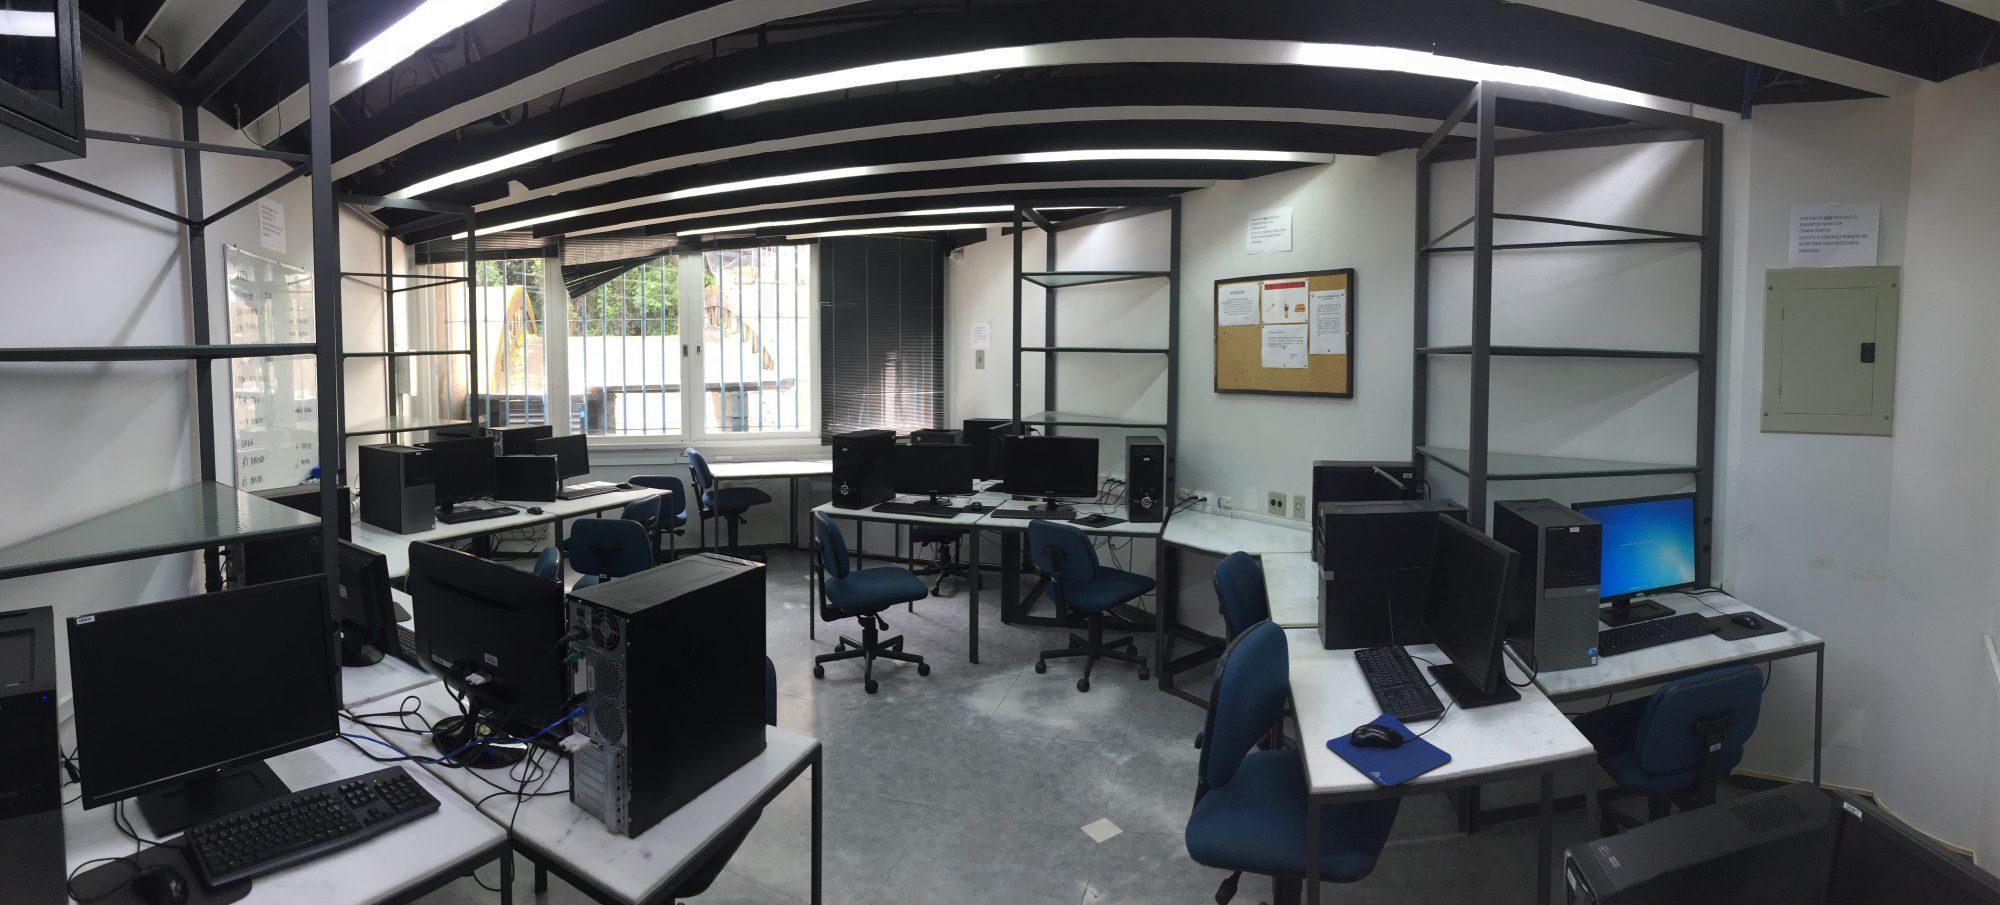 Advanced Computational Laboratory computer room.